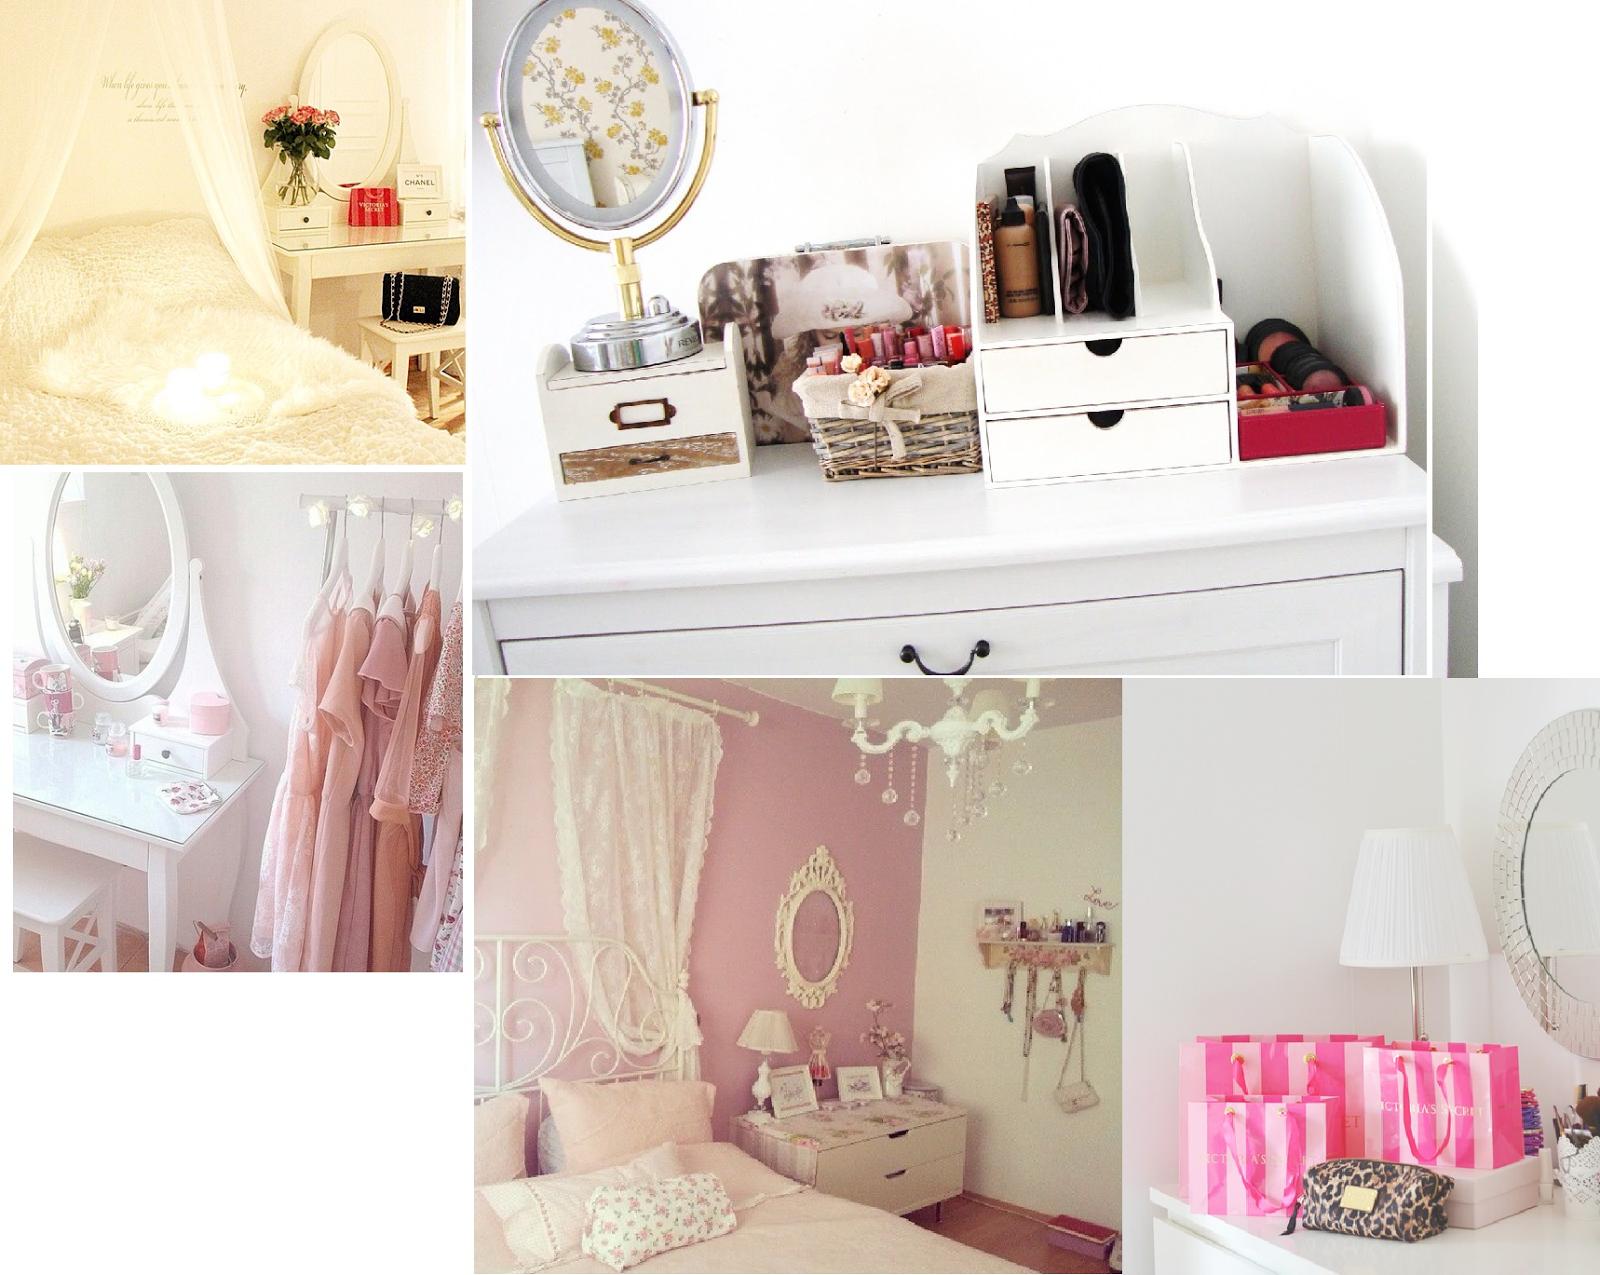 Lilia inspirations rangement maquillage et chambre 2 - Boite rangement maquillage ikea ...